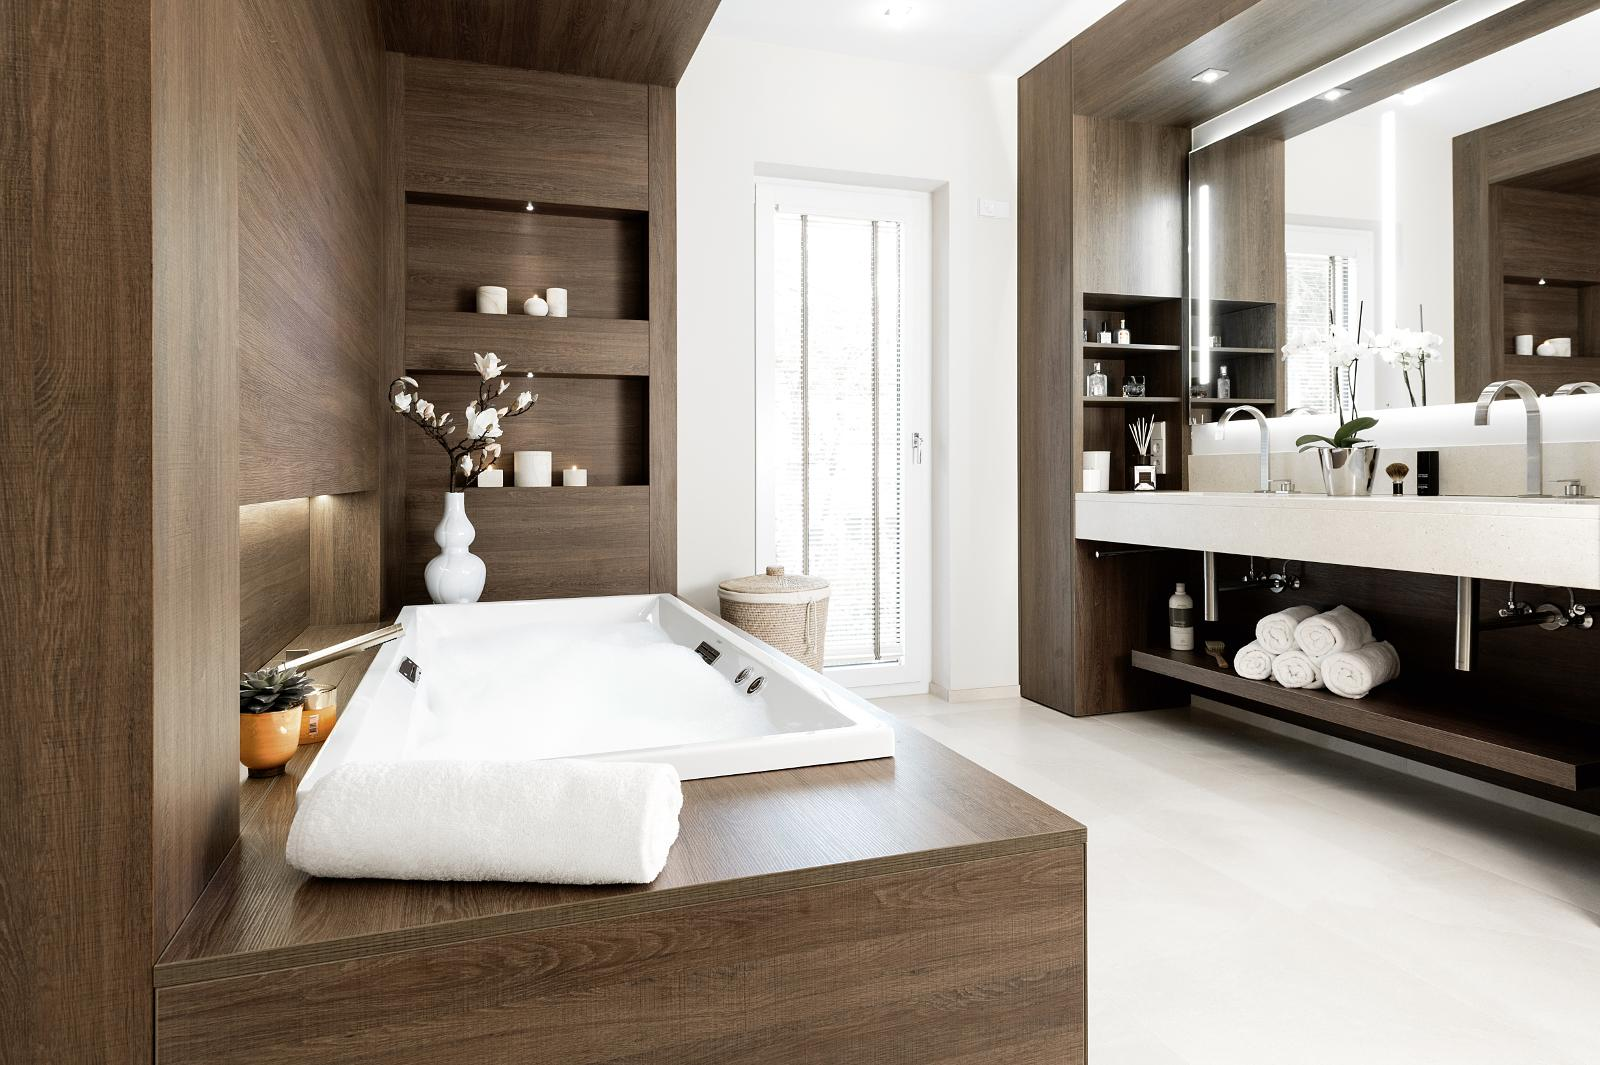 Holz im Badezimmer | müller + sohn | Frechen (Köln)